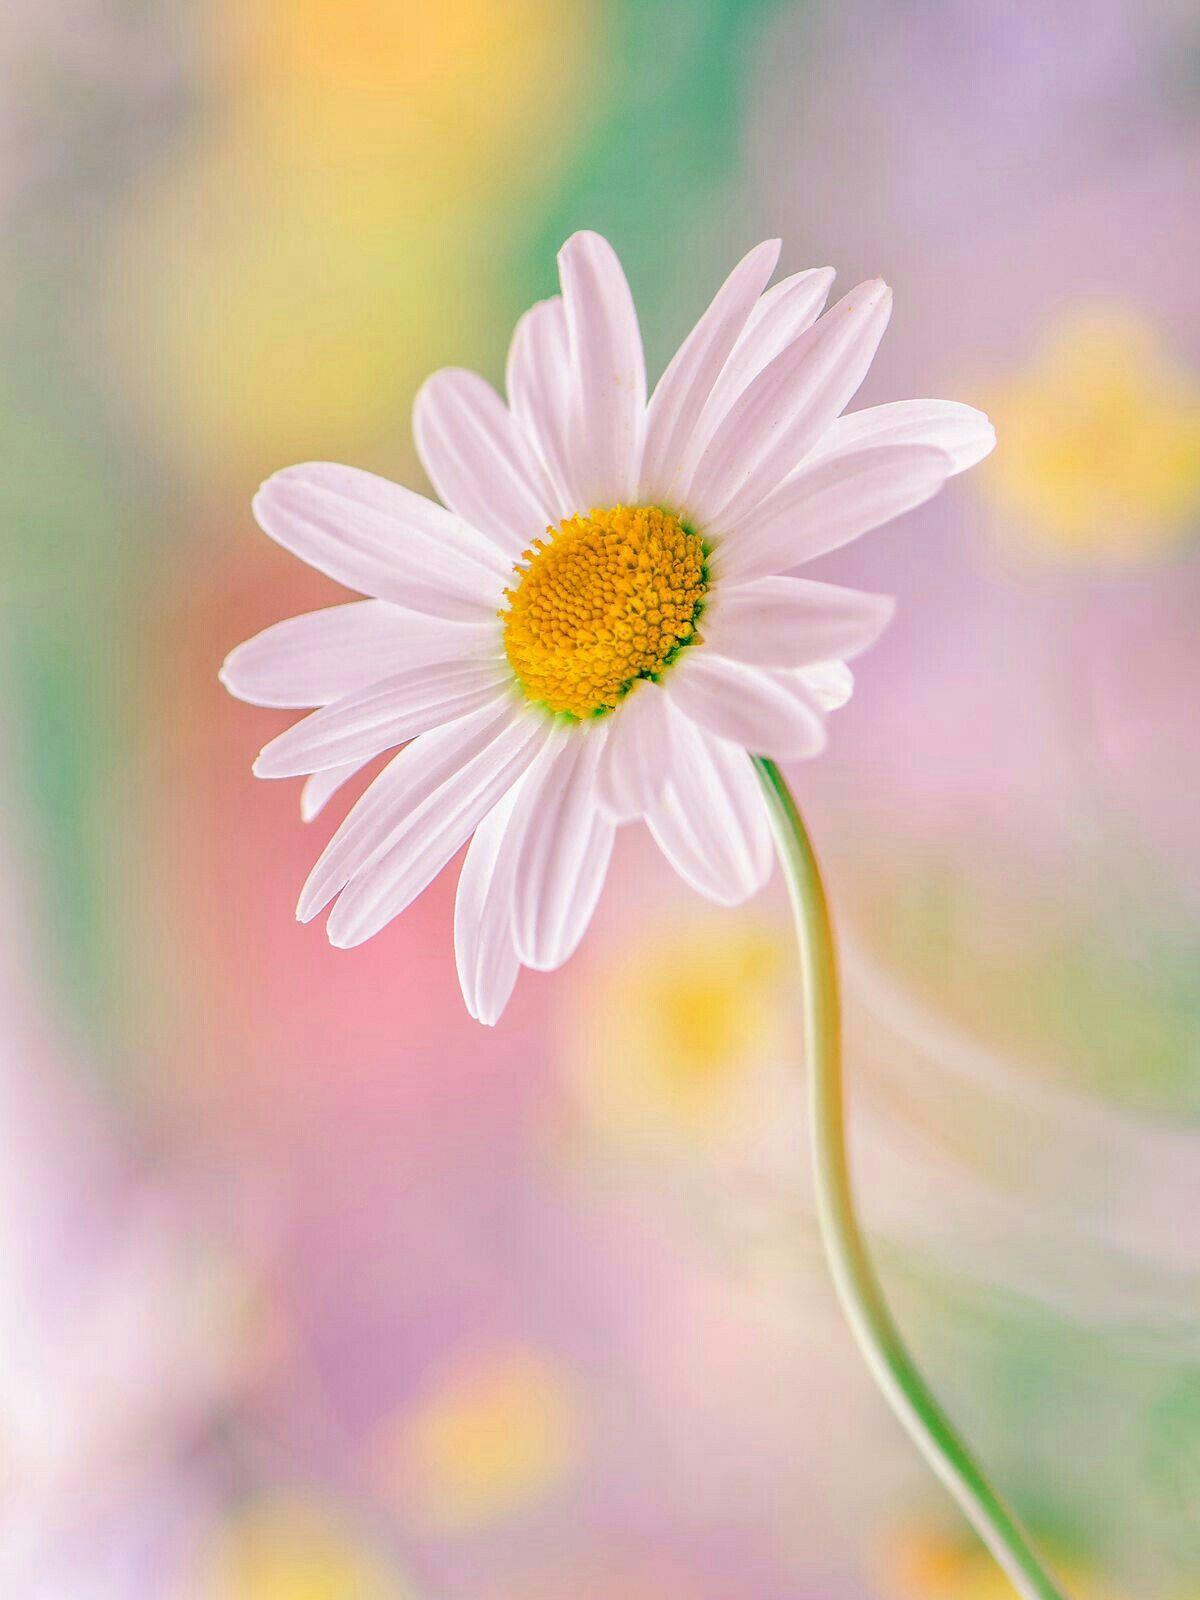 Pin By Magorzata G On Kwiaty Margaretki Pinterest Flowers